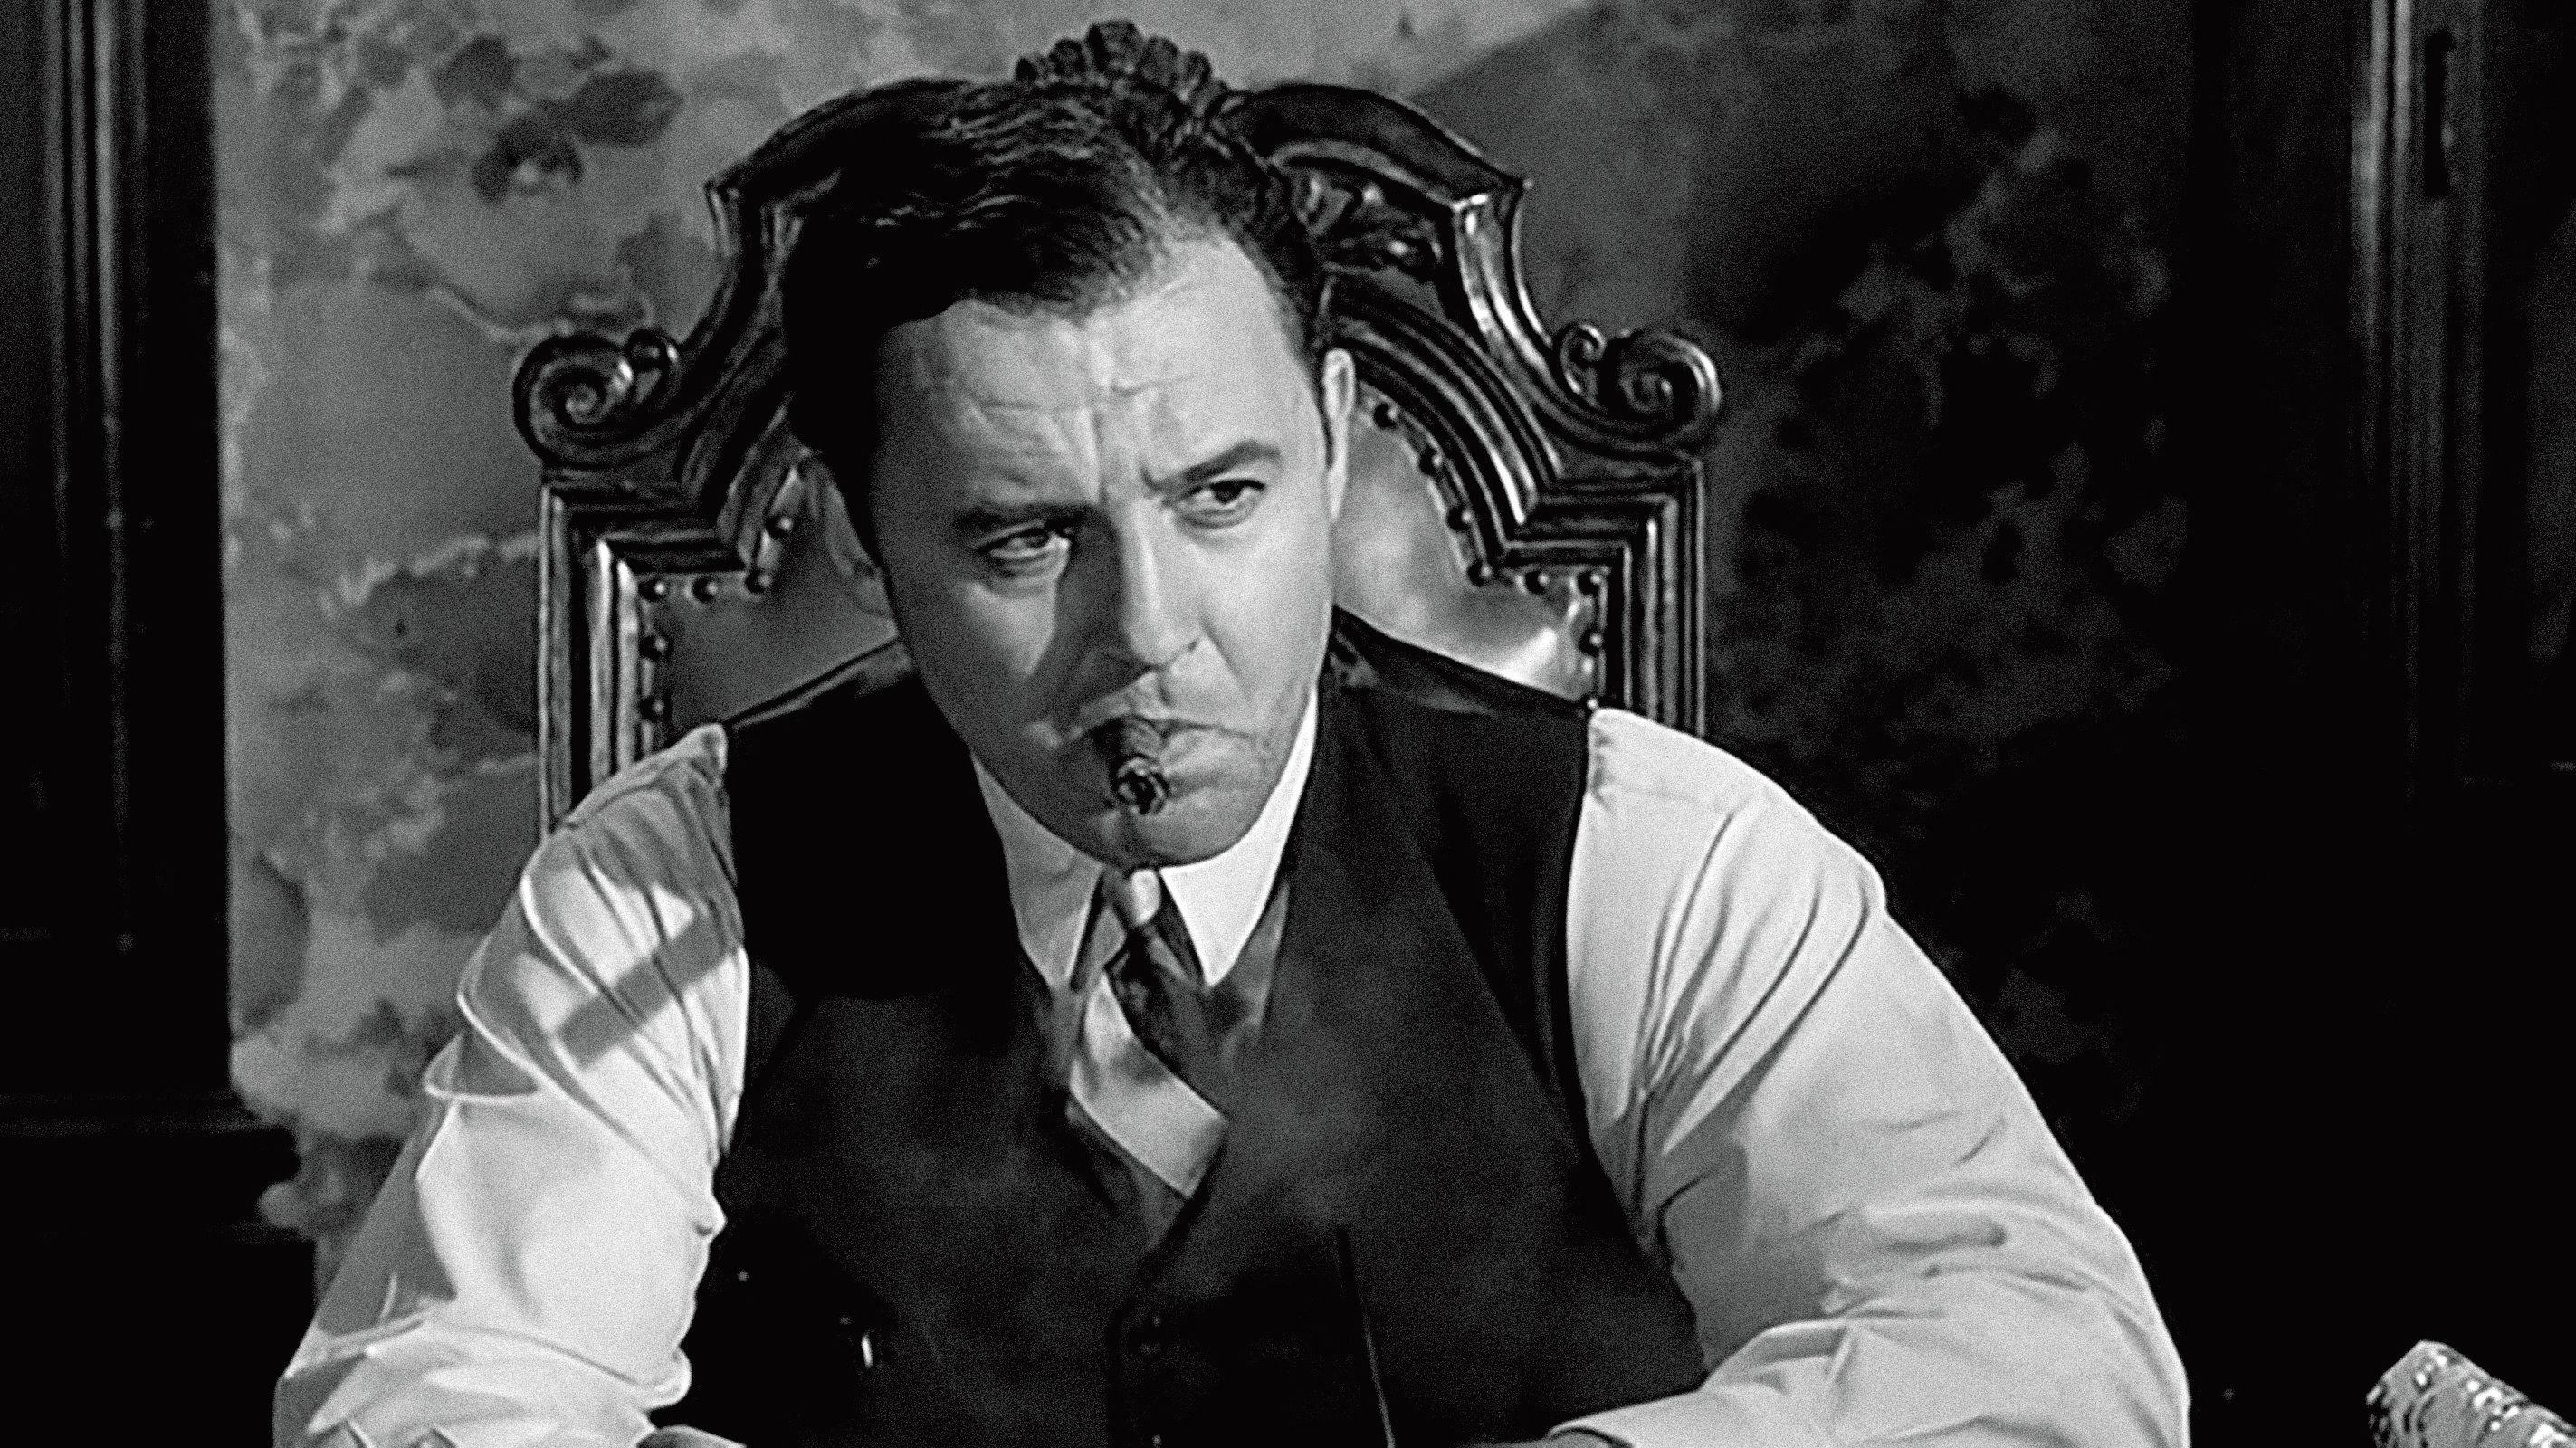 Rod Steiger playing Al Capone